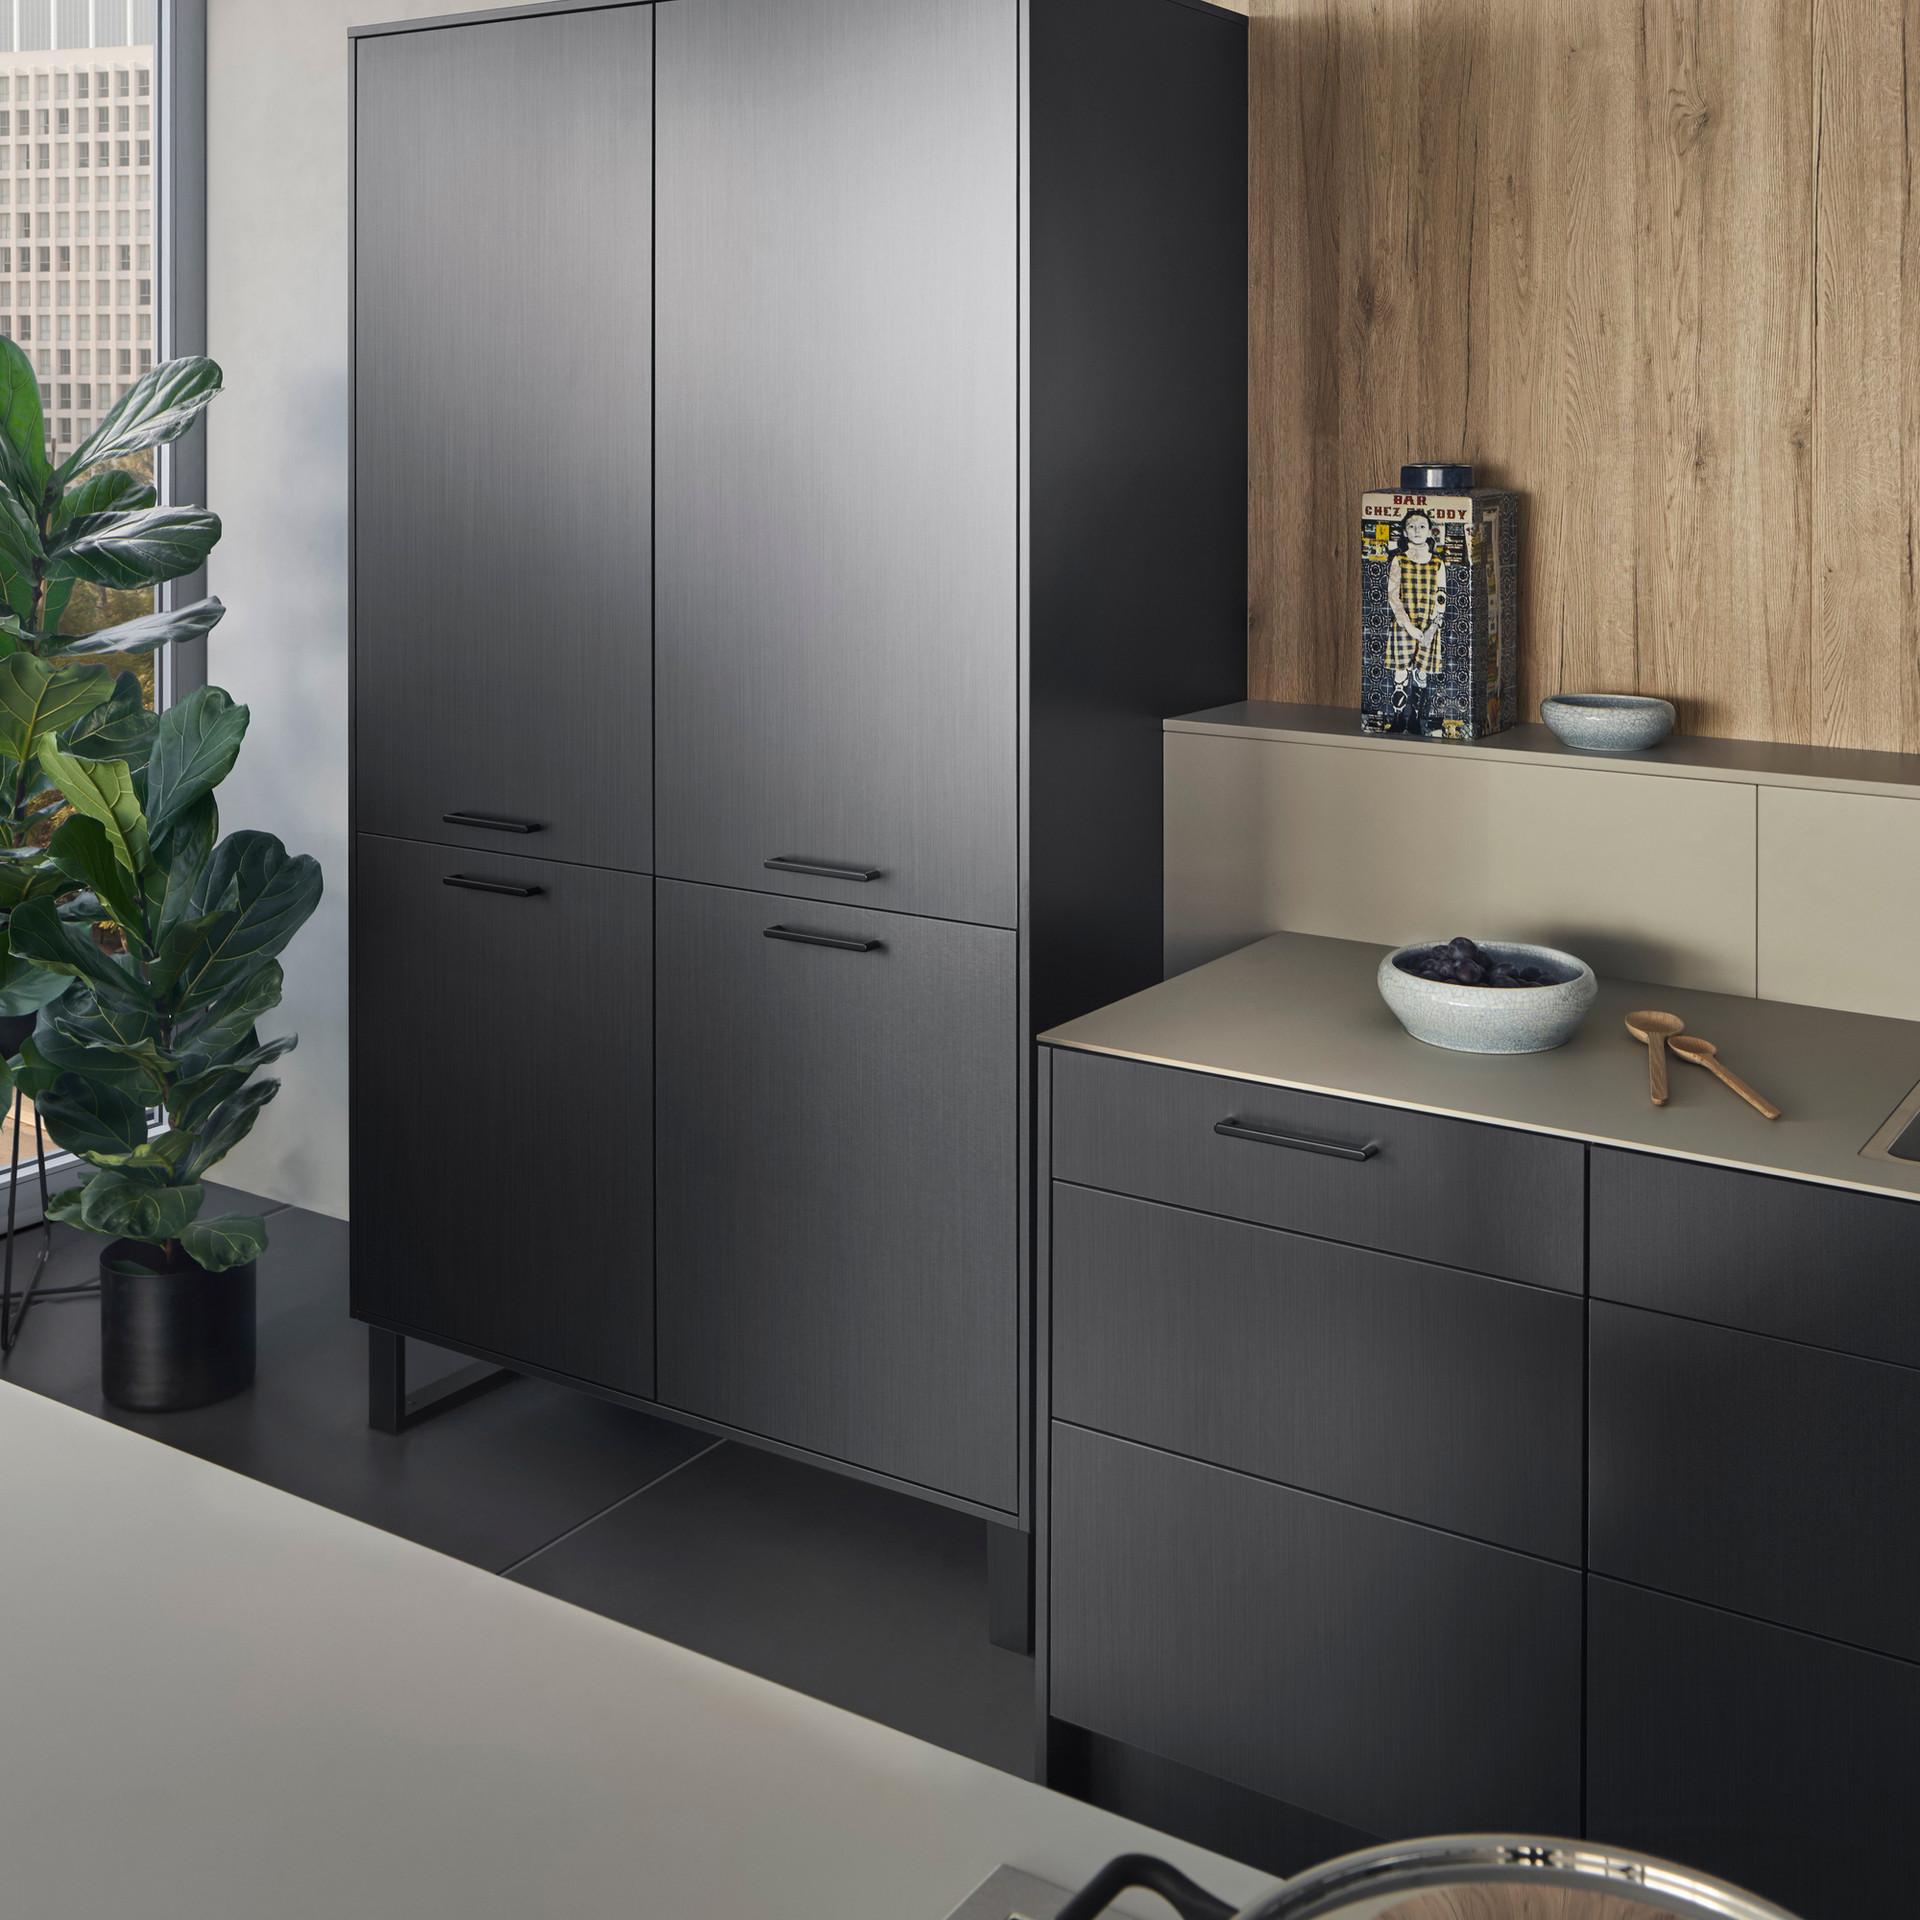 Leicht Metea metallic finish pantry cabinet